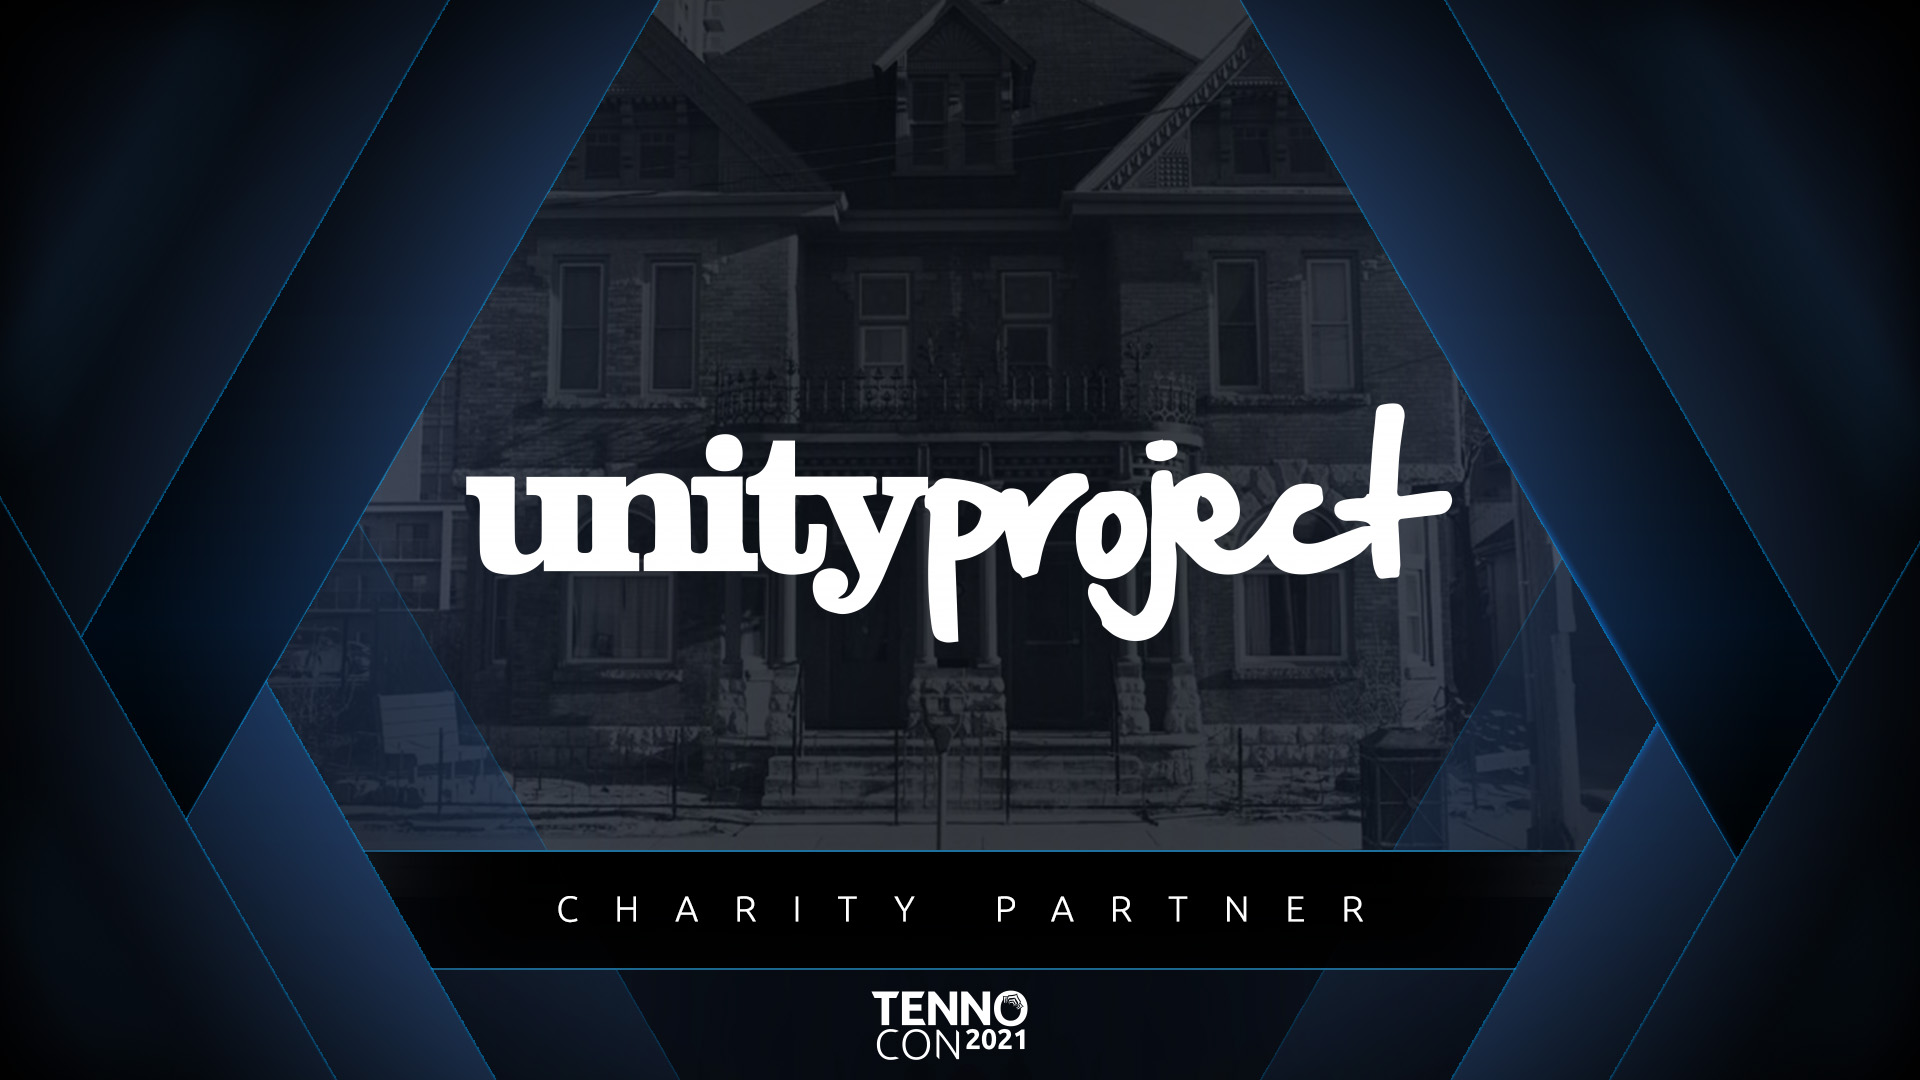 TennoCon2021_CharityPartner_1080p.jpg.65